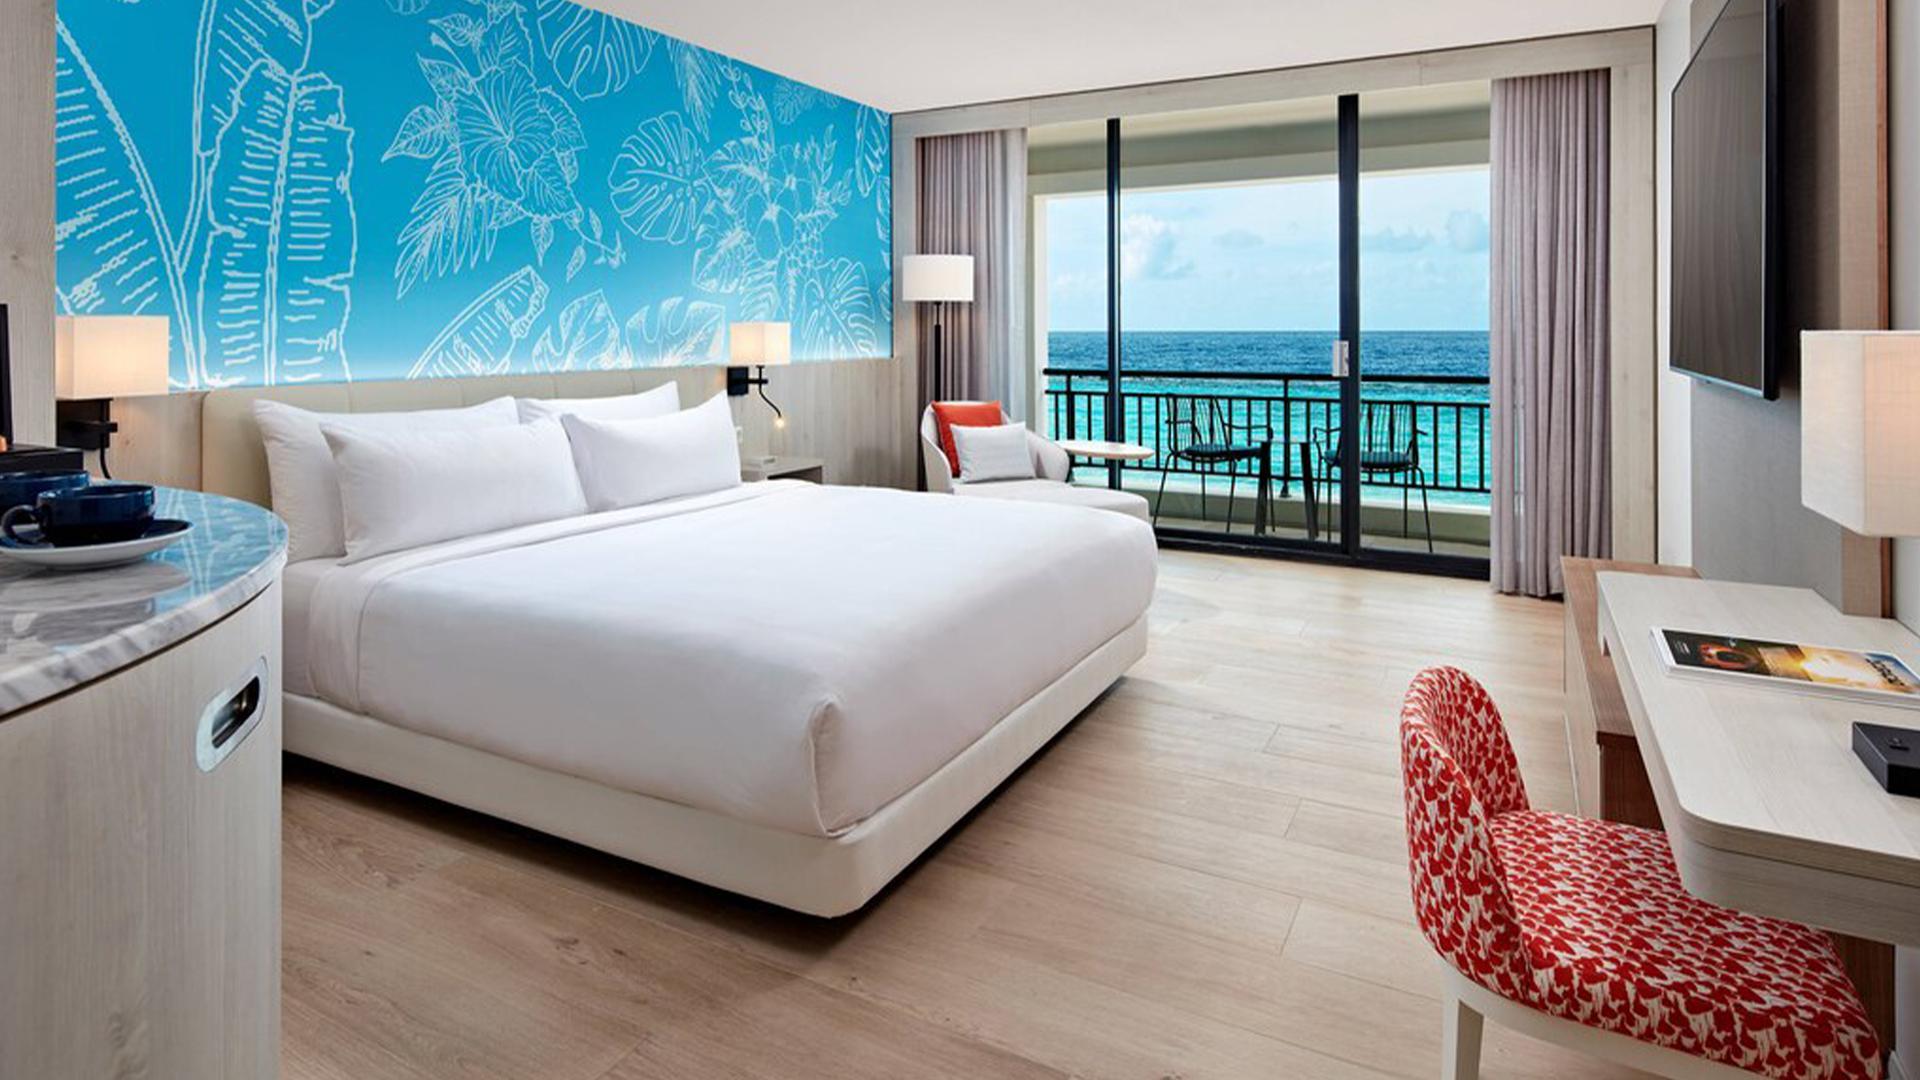 Ocean Front King Room image 1 at Curaçao Marriott Beach Resort by null, Curaçao, Curaçao